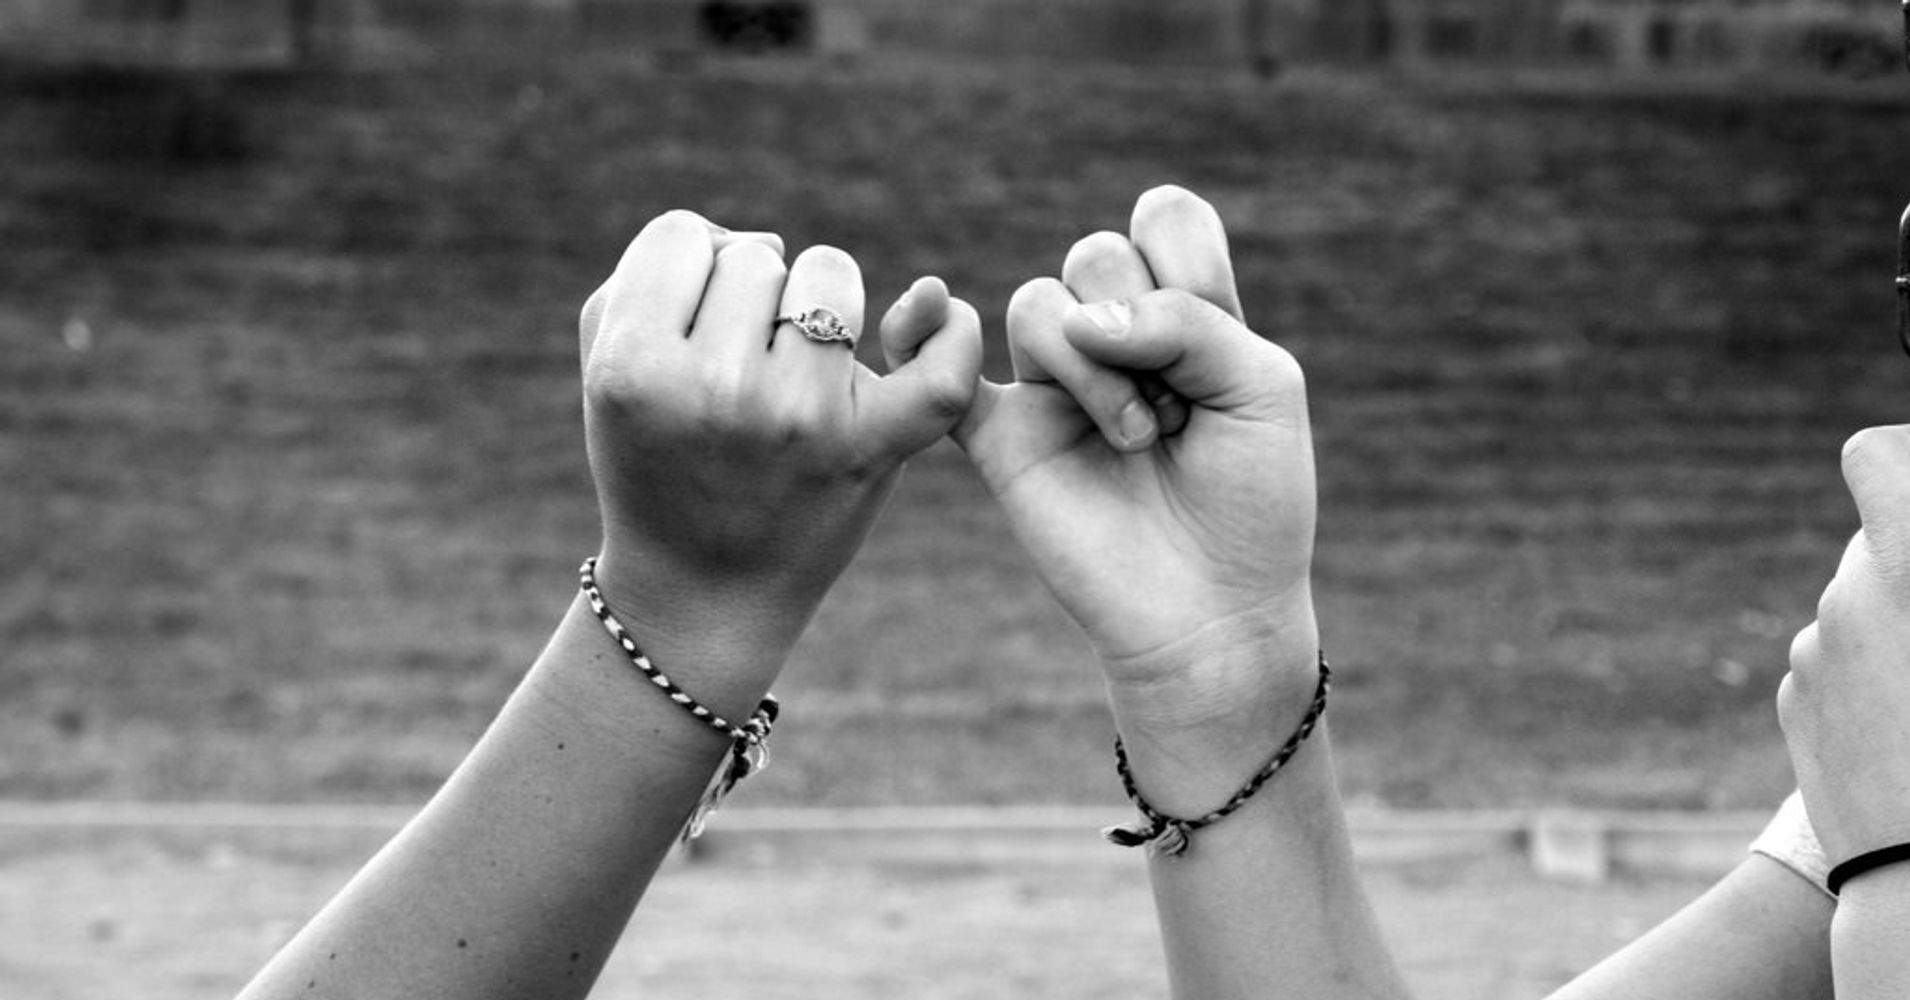 how to handle heartbreak relationship ends